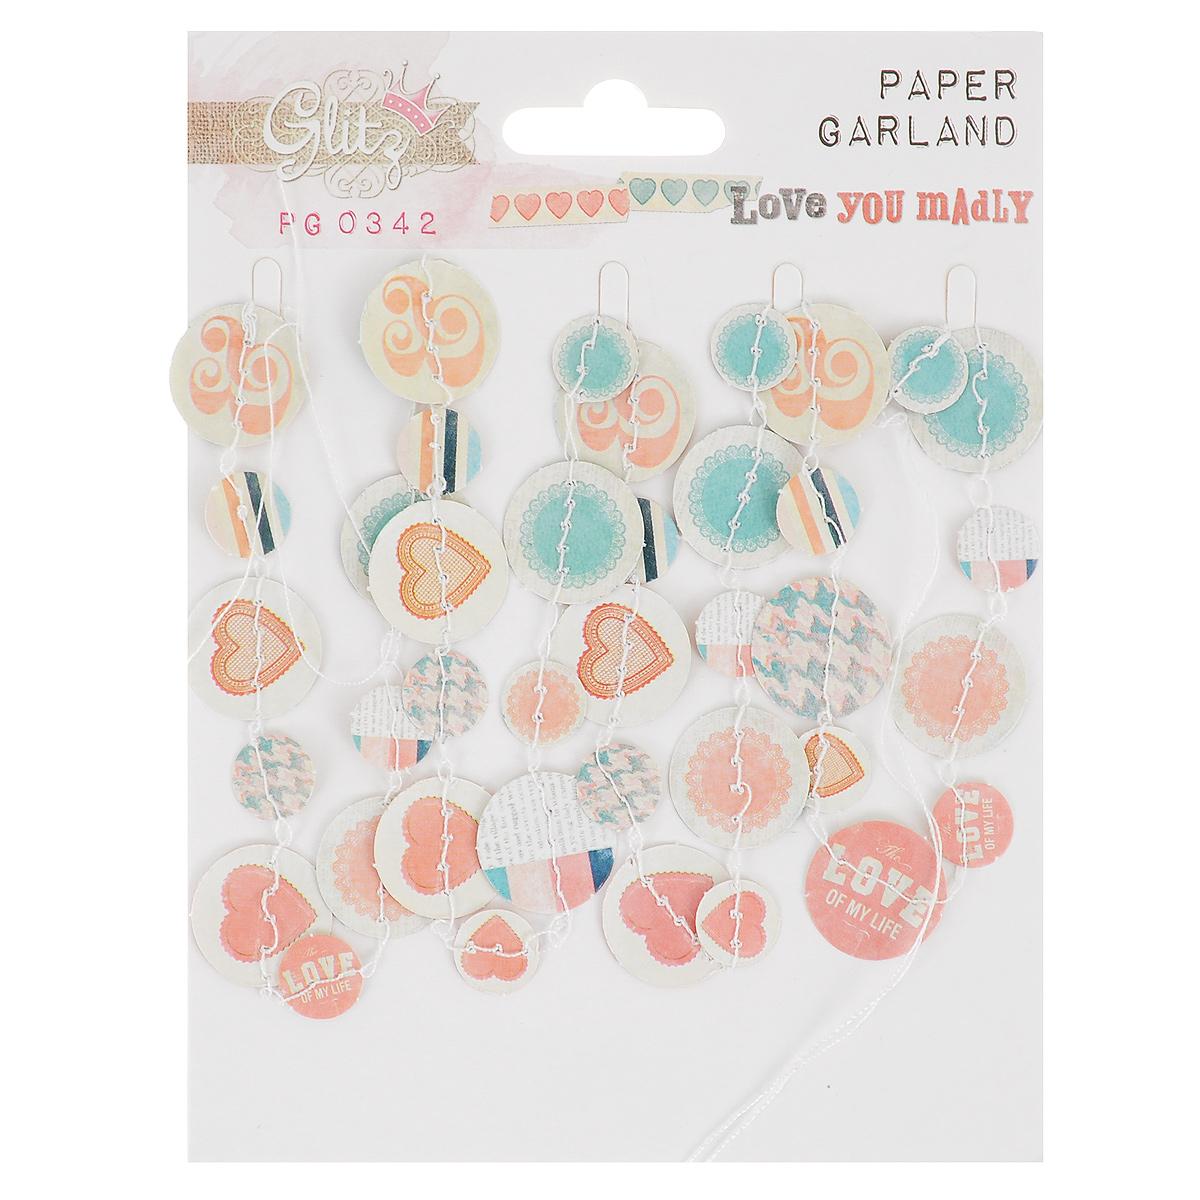 Декоративное украшение Paper Garland Glitz Love You Madly, длина 1,6 м